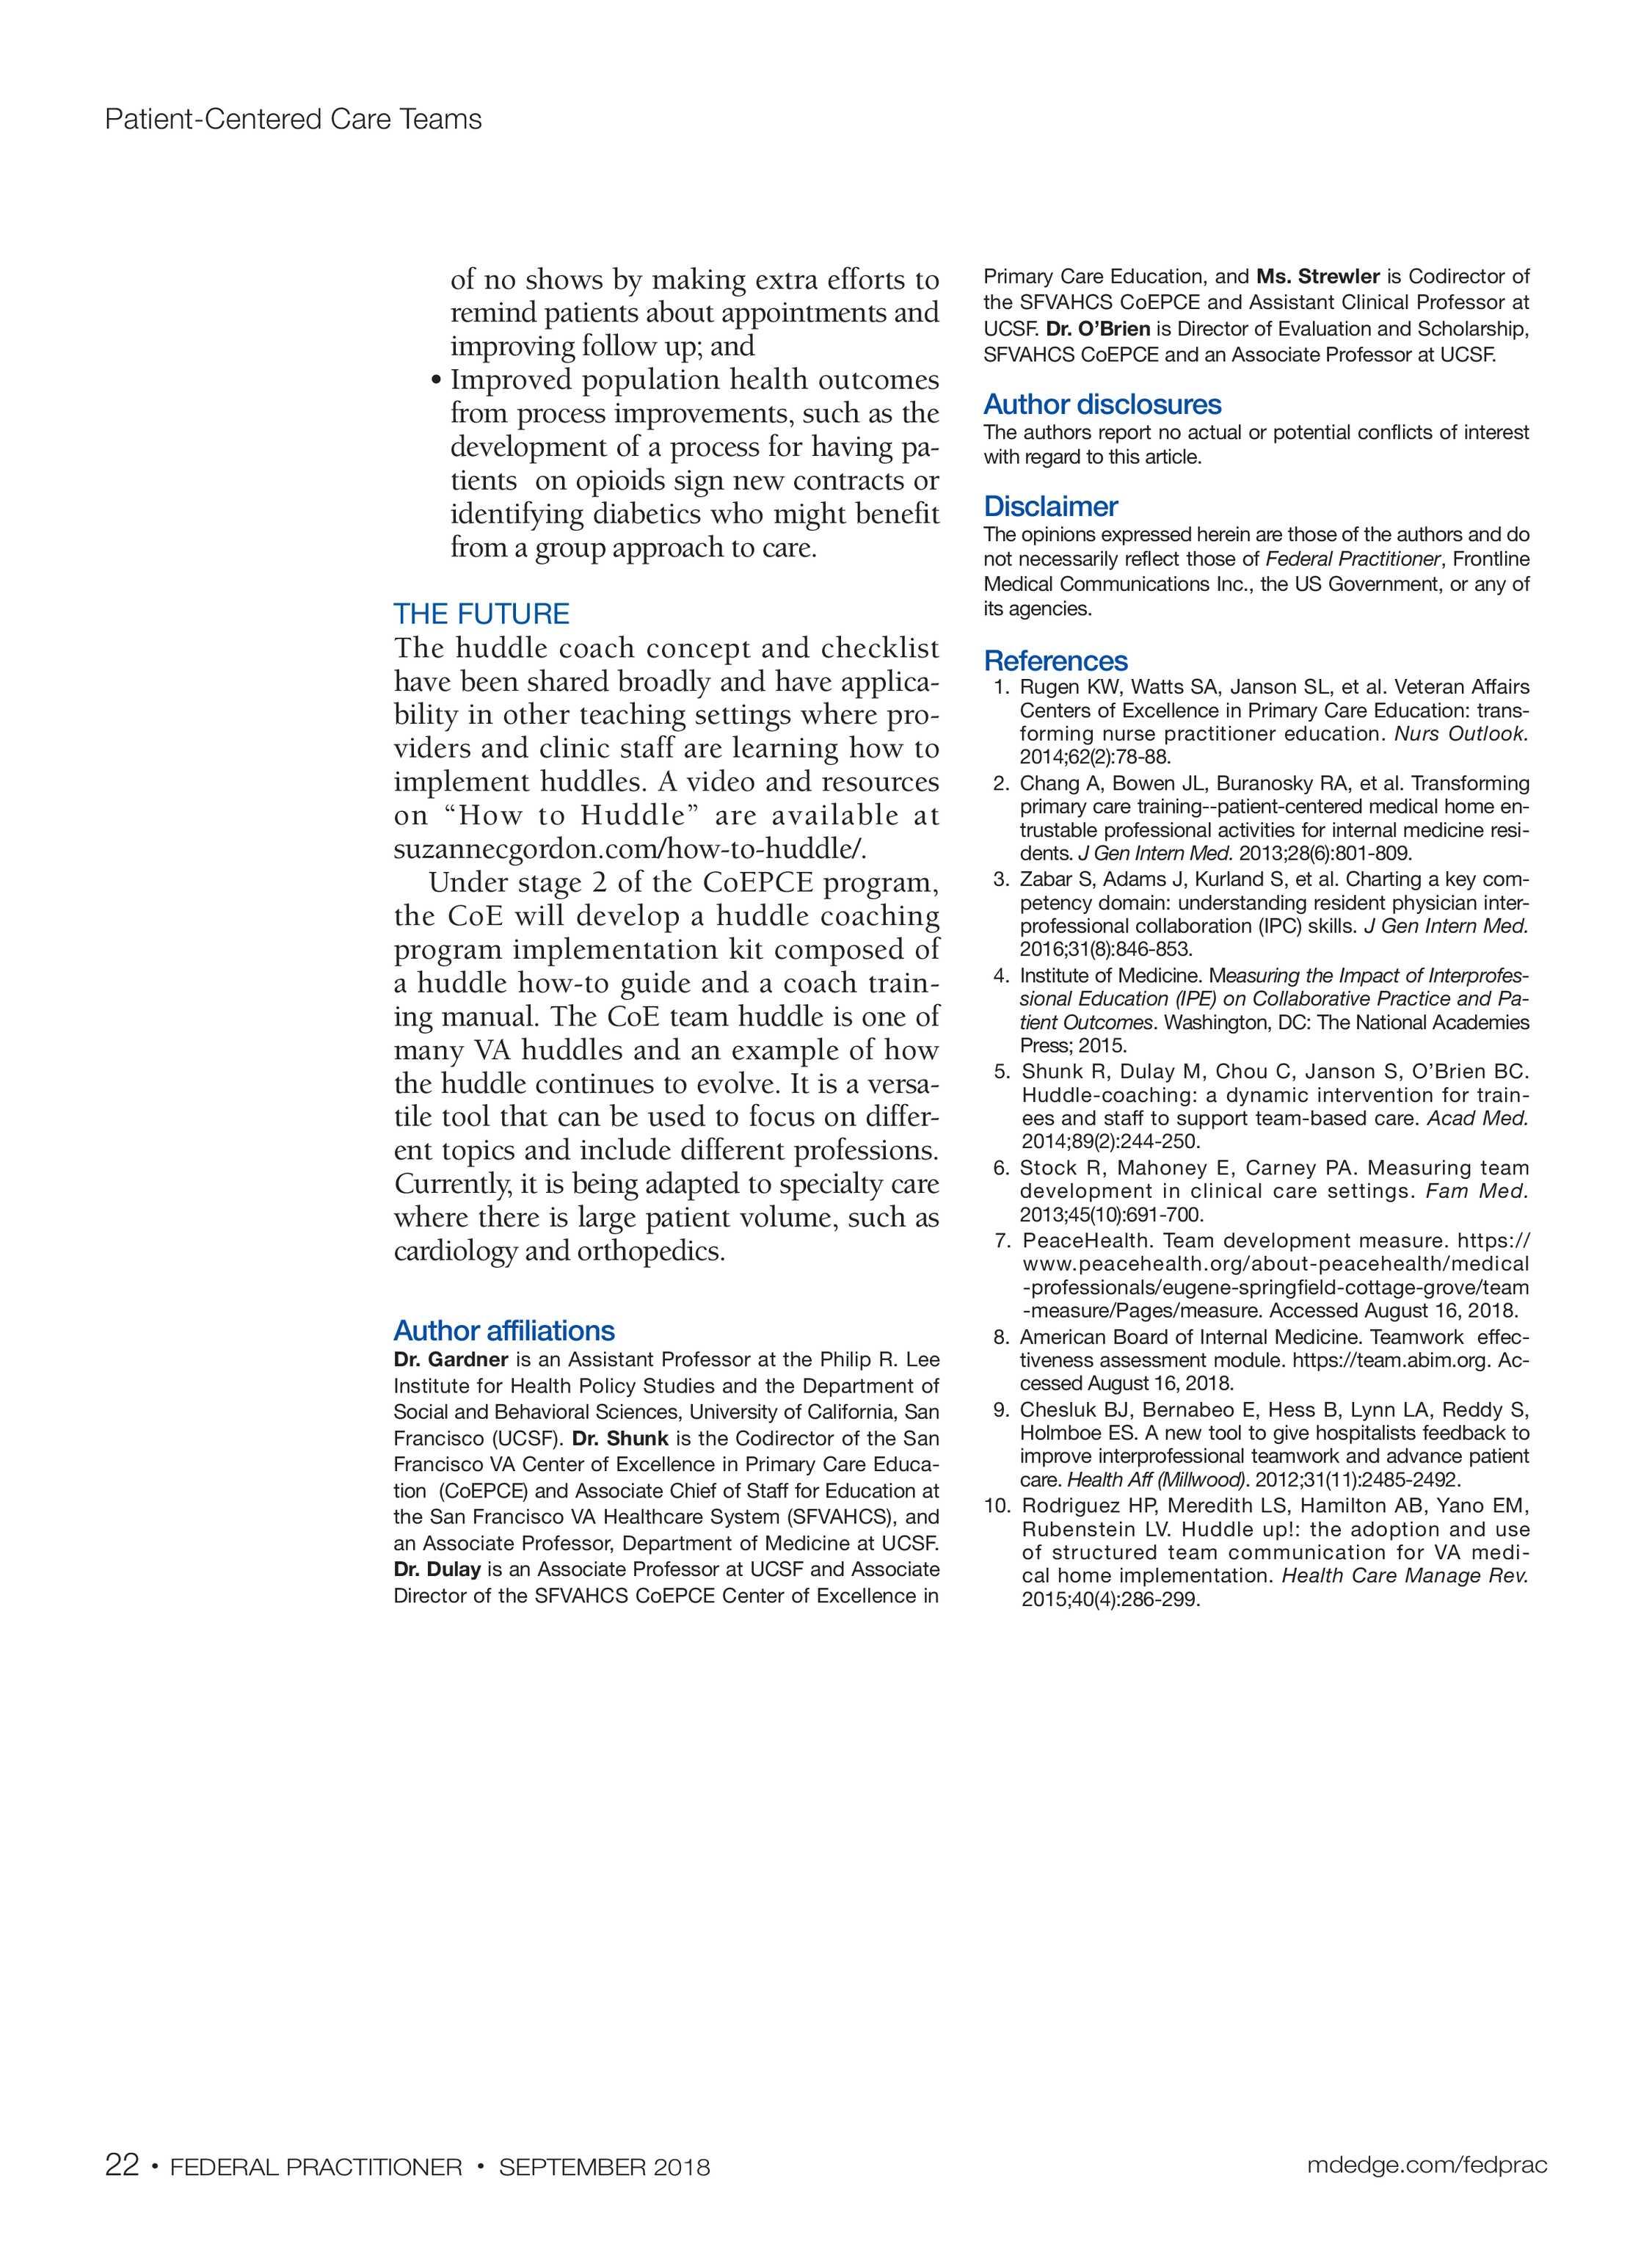 Federal Practitioner - September2018 - page 23